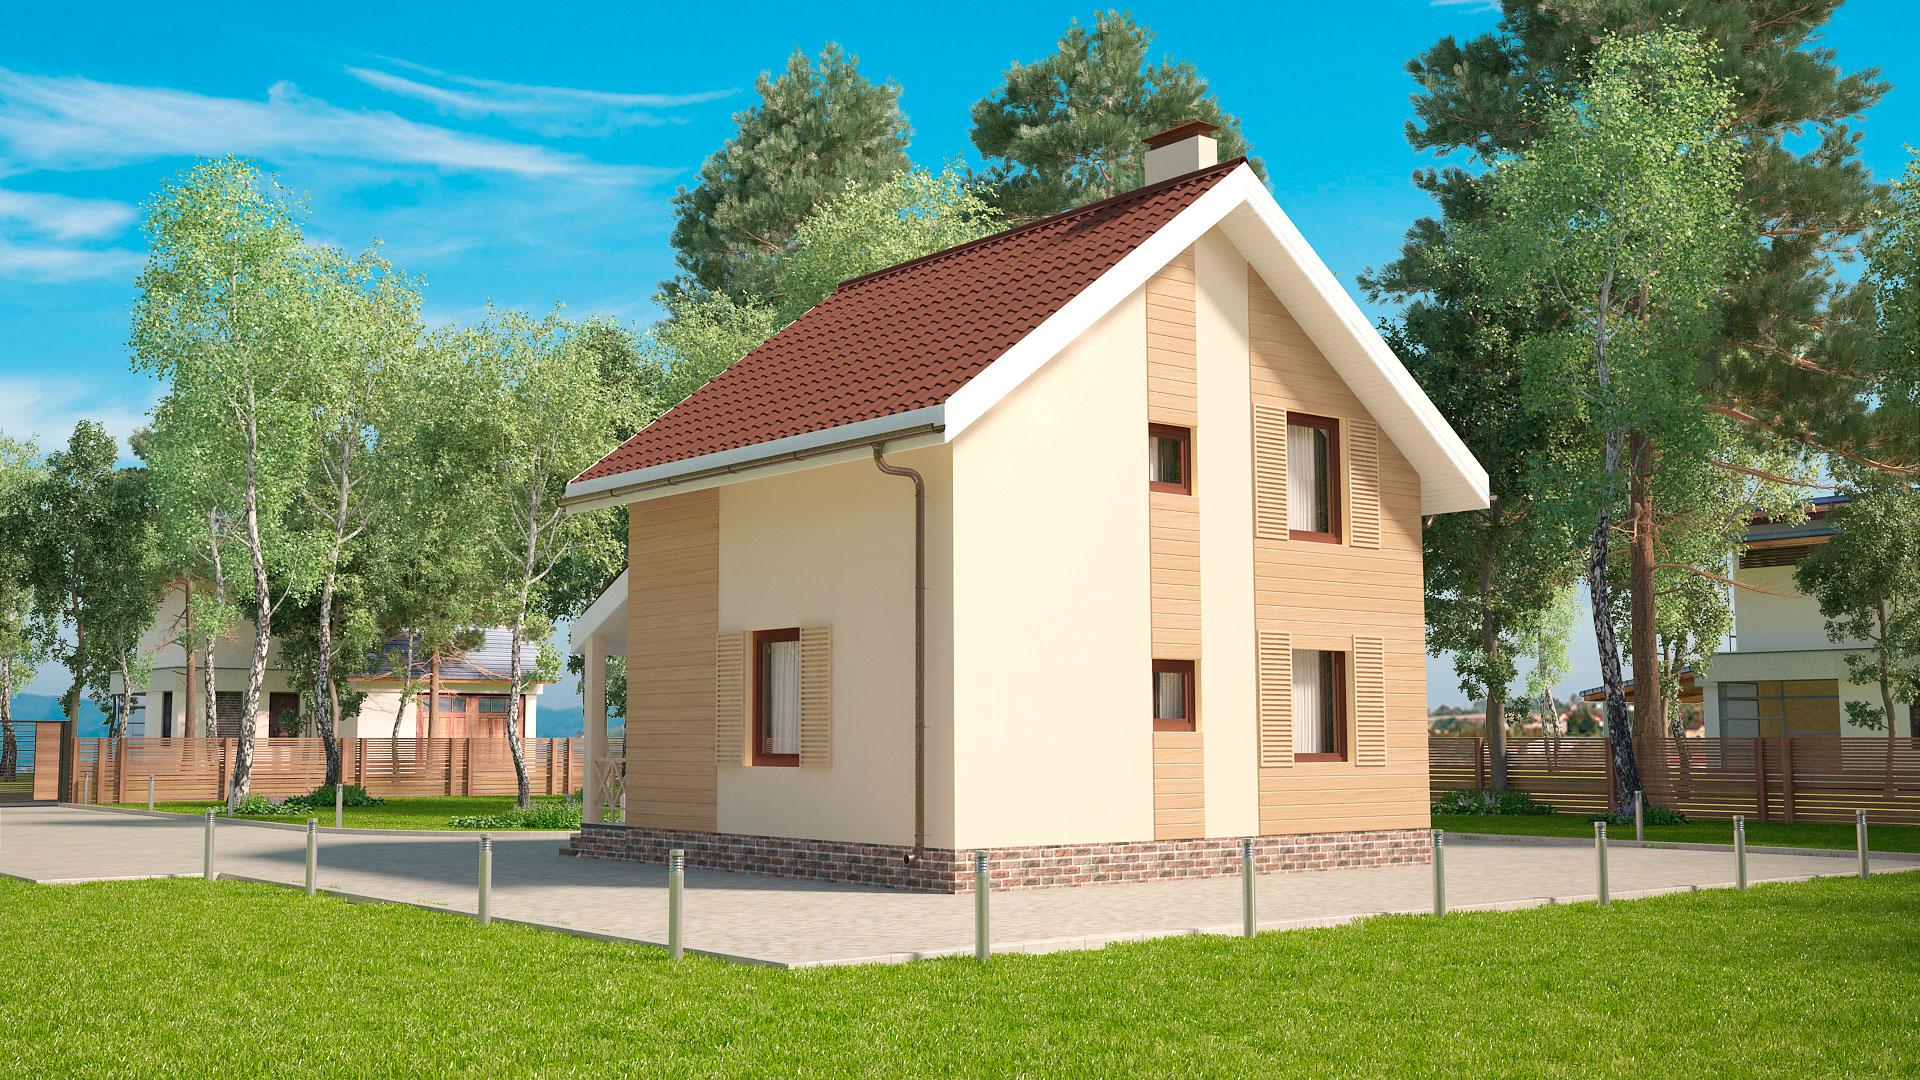 Задний фасад двухэтажного дома, проект БЭНПАН МС-89.